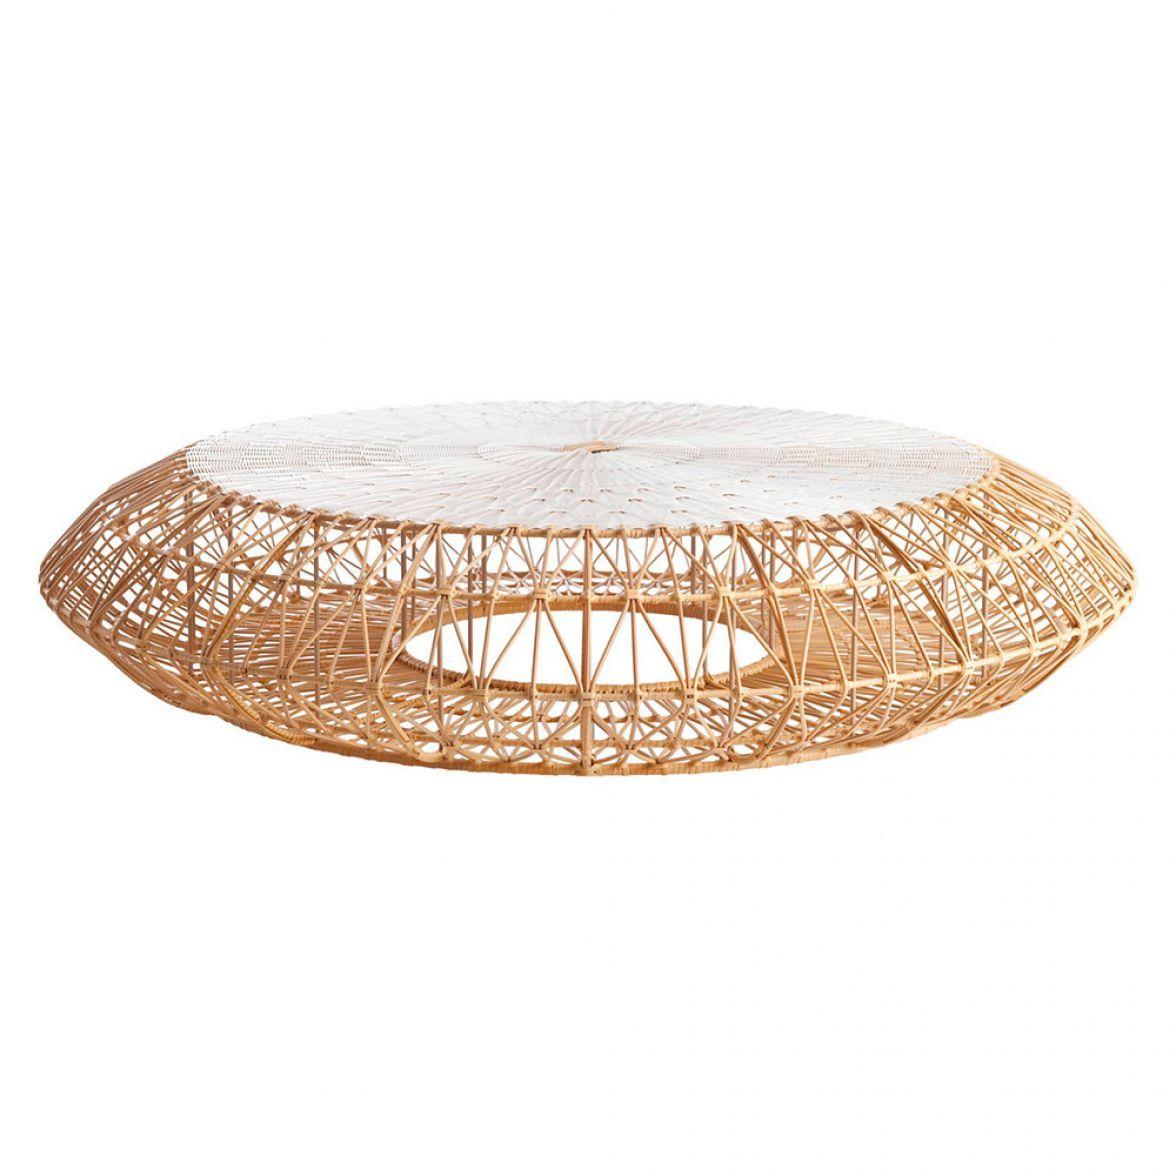 Dreamcatcher stool